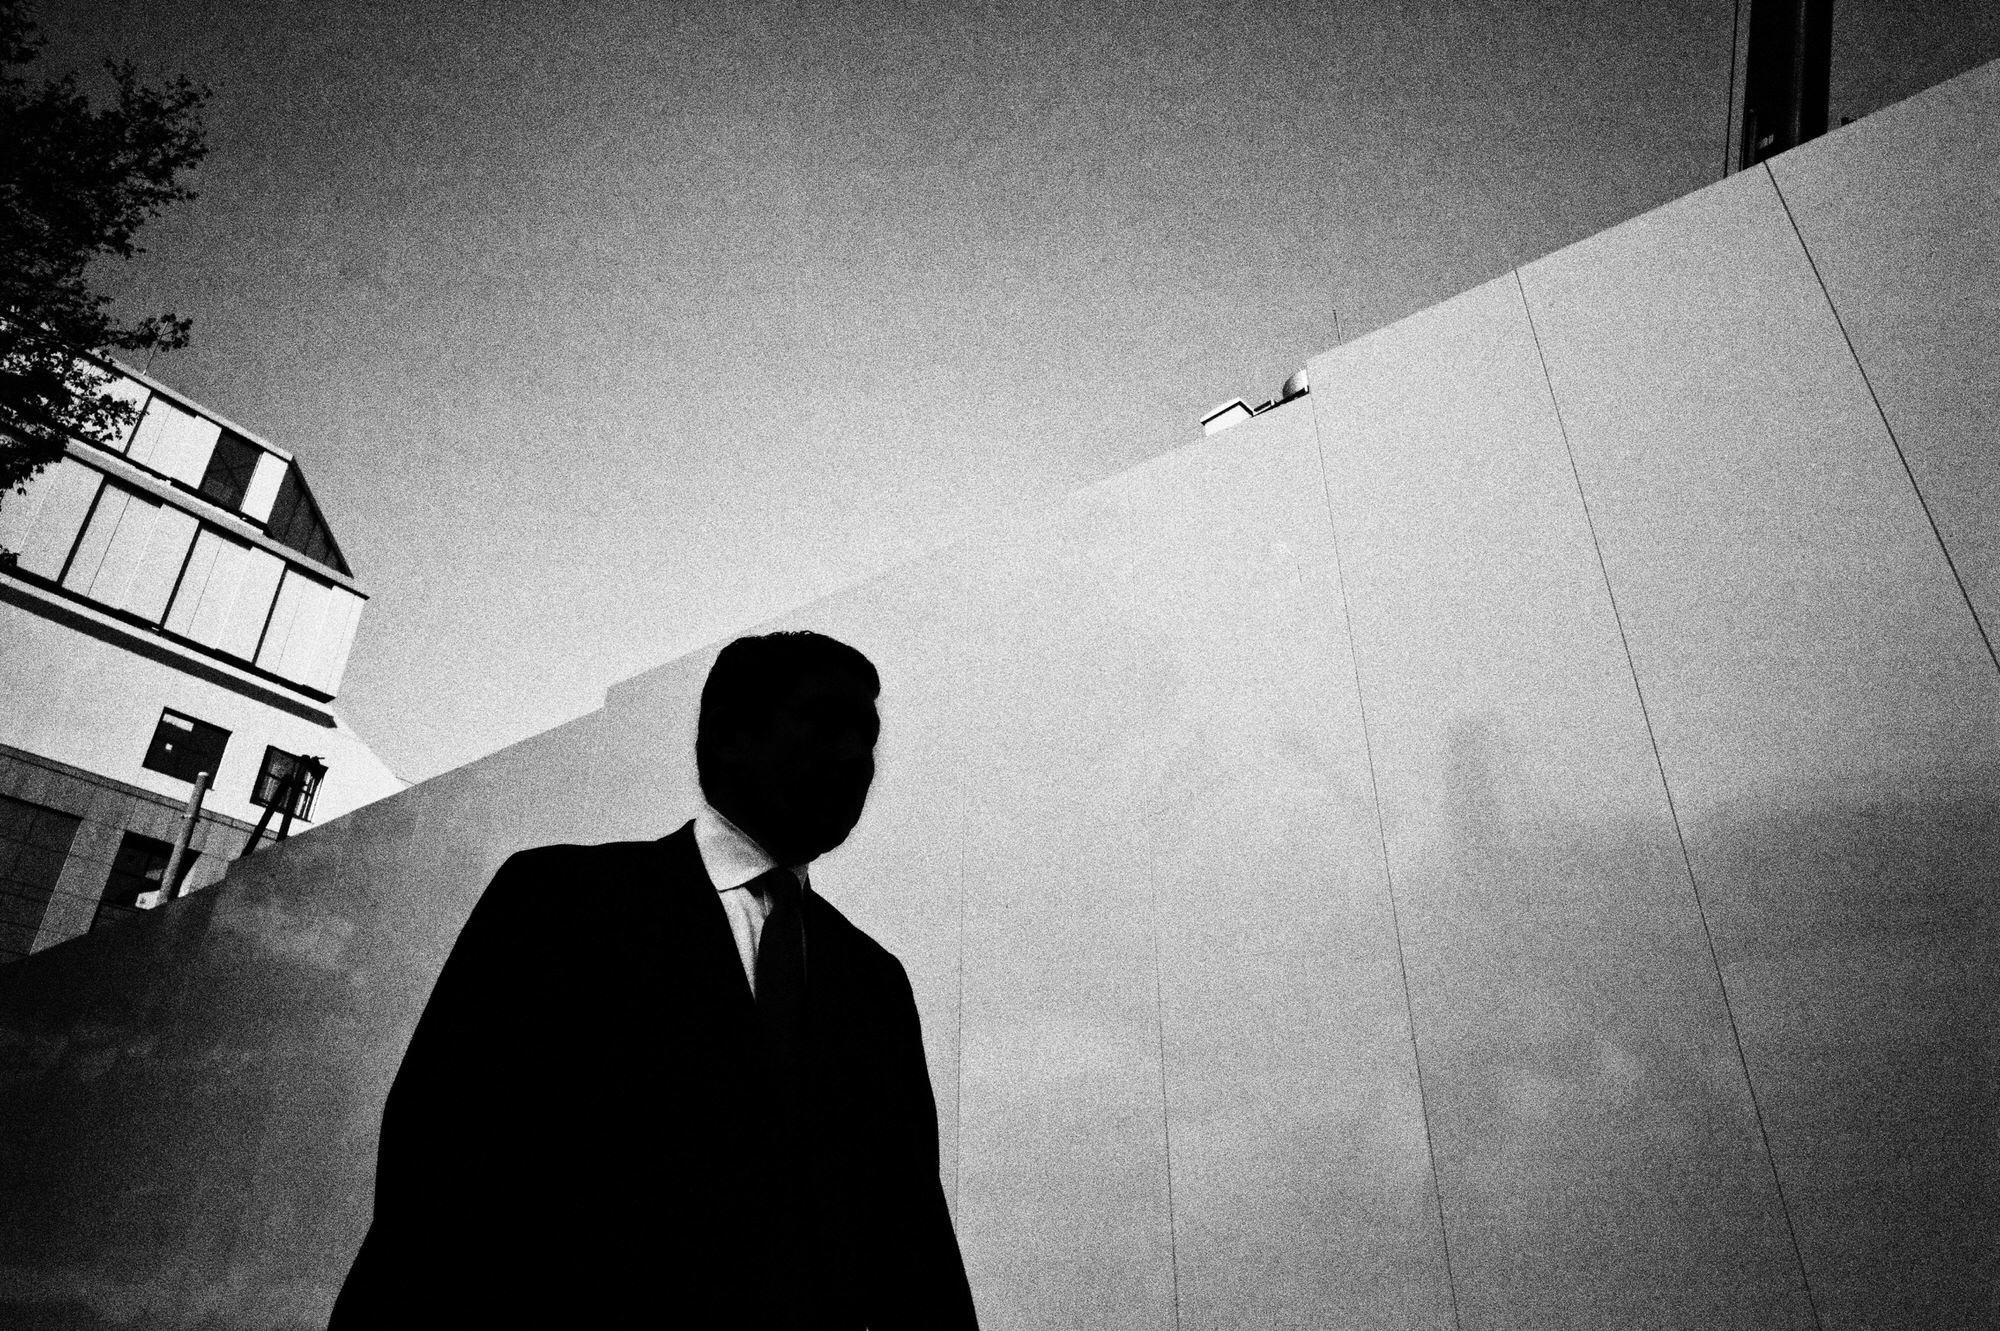 dark-skies-over-tokyo-silhouette-suit-2012-leica m9-21mm-eric kim street photograpy - black and white - Monochrome-4.jpg